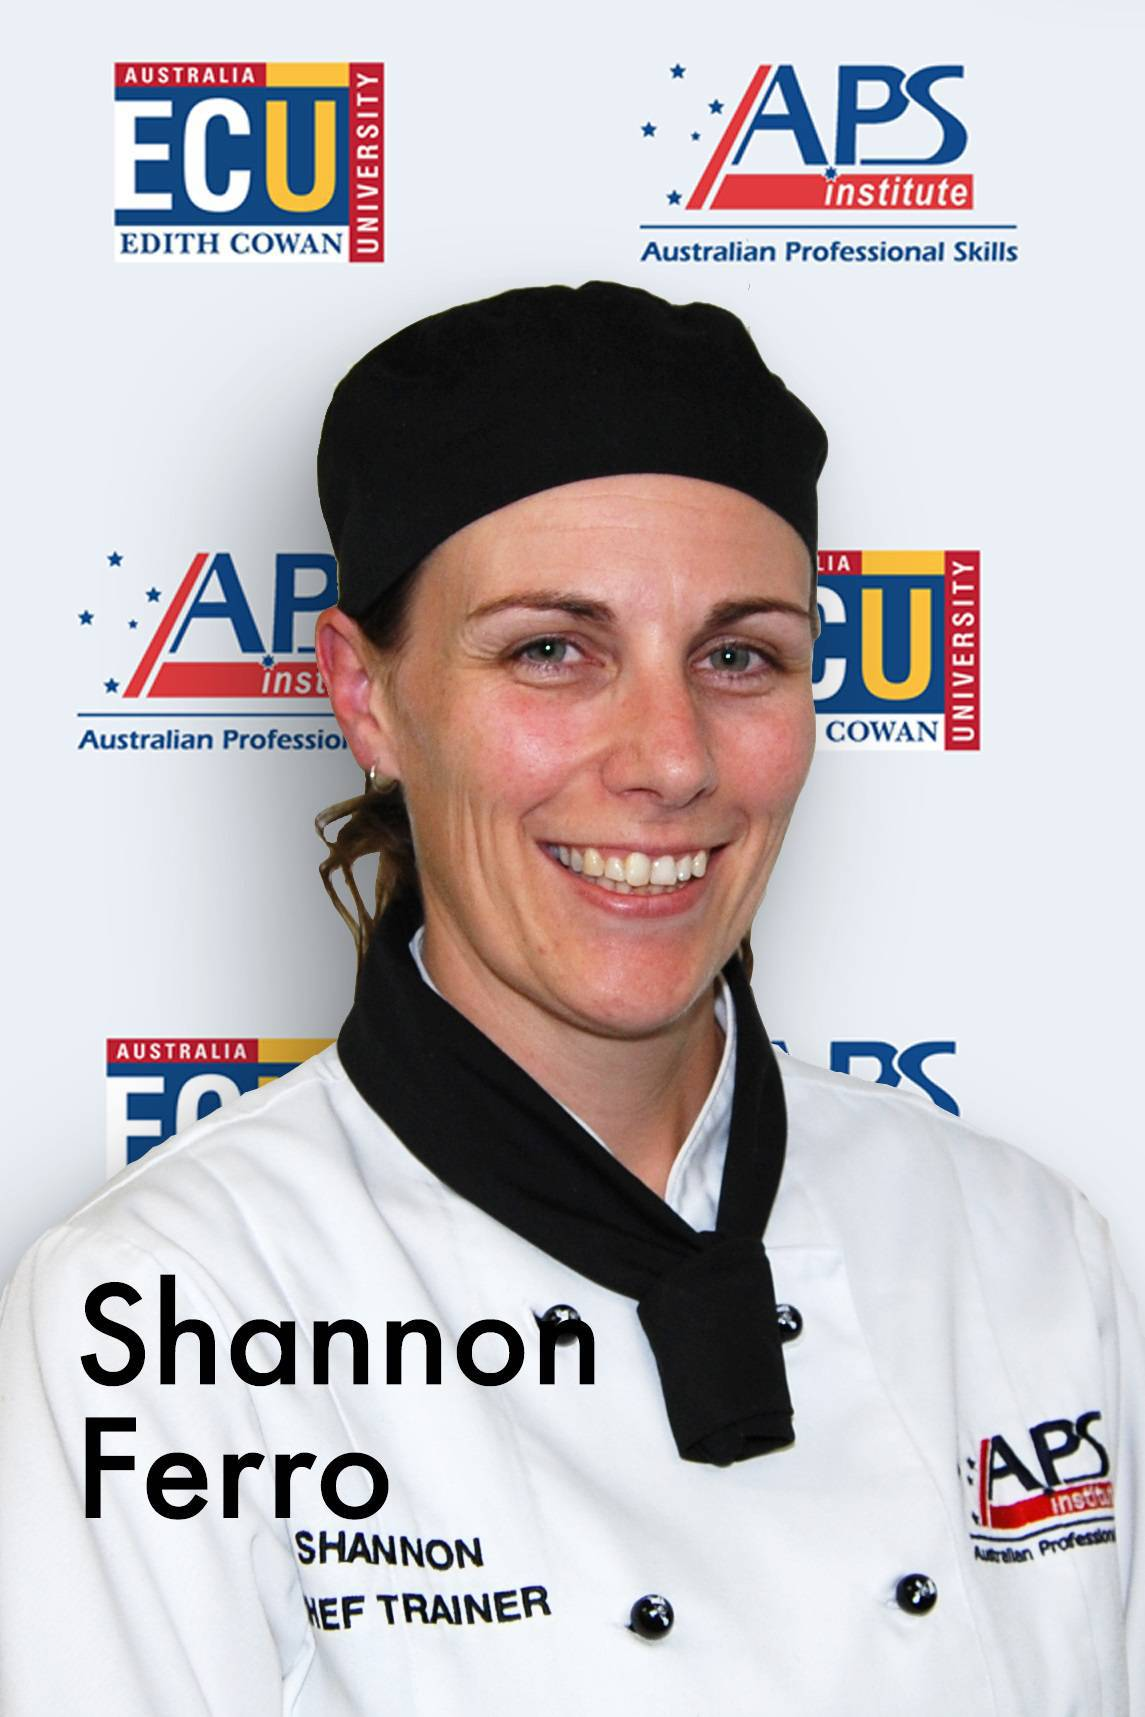 Shannon Ferro